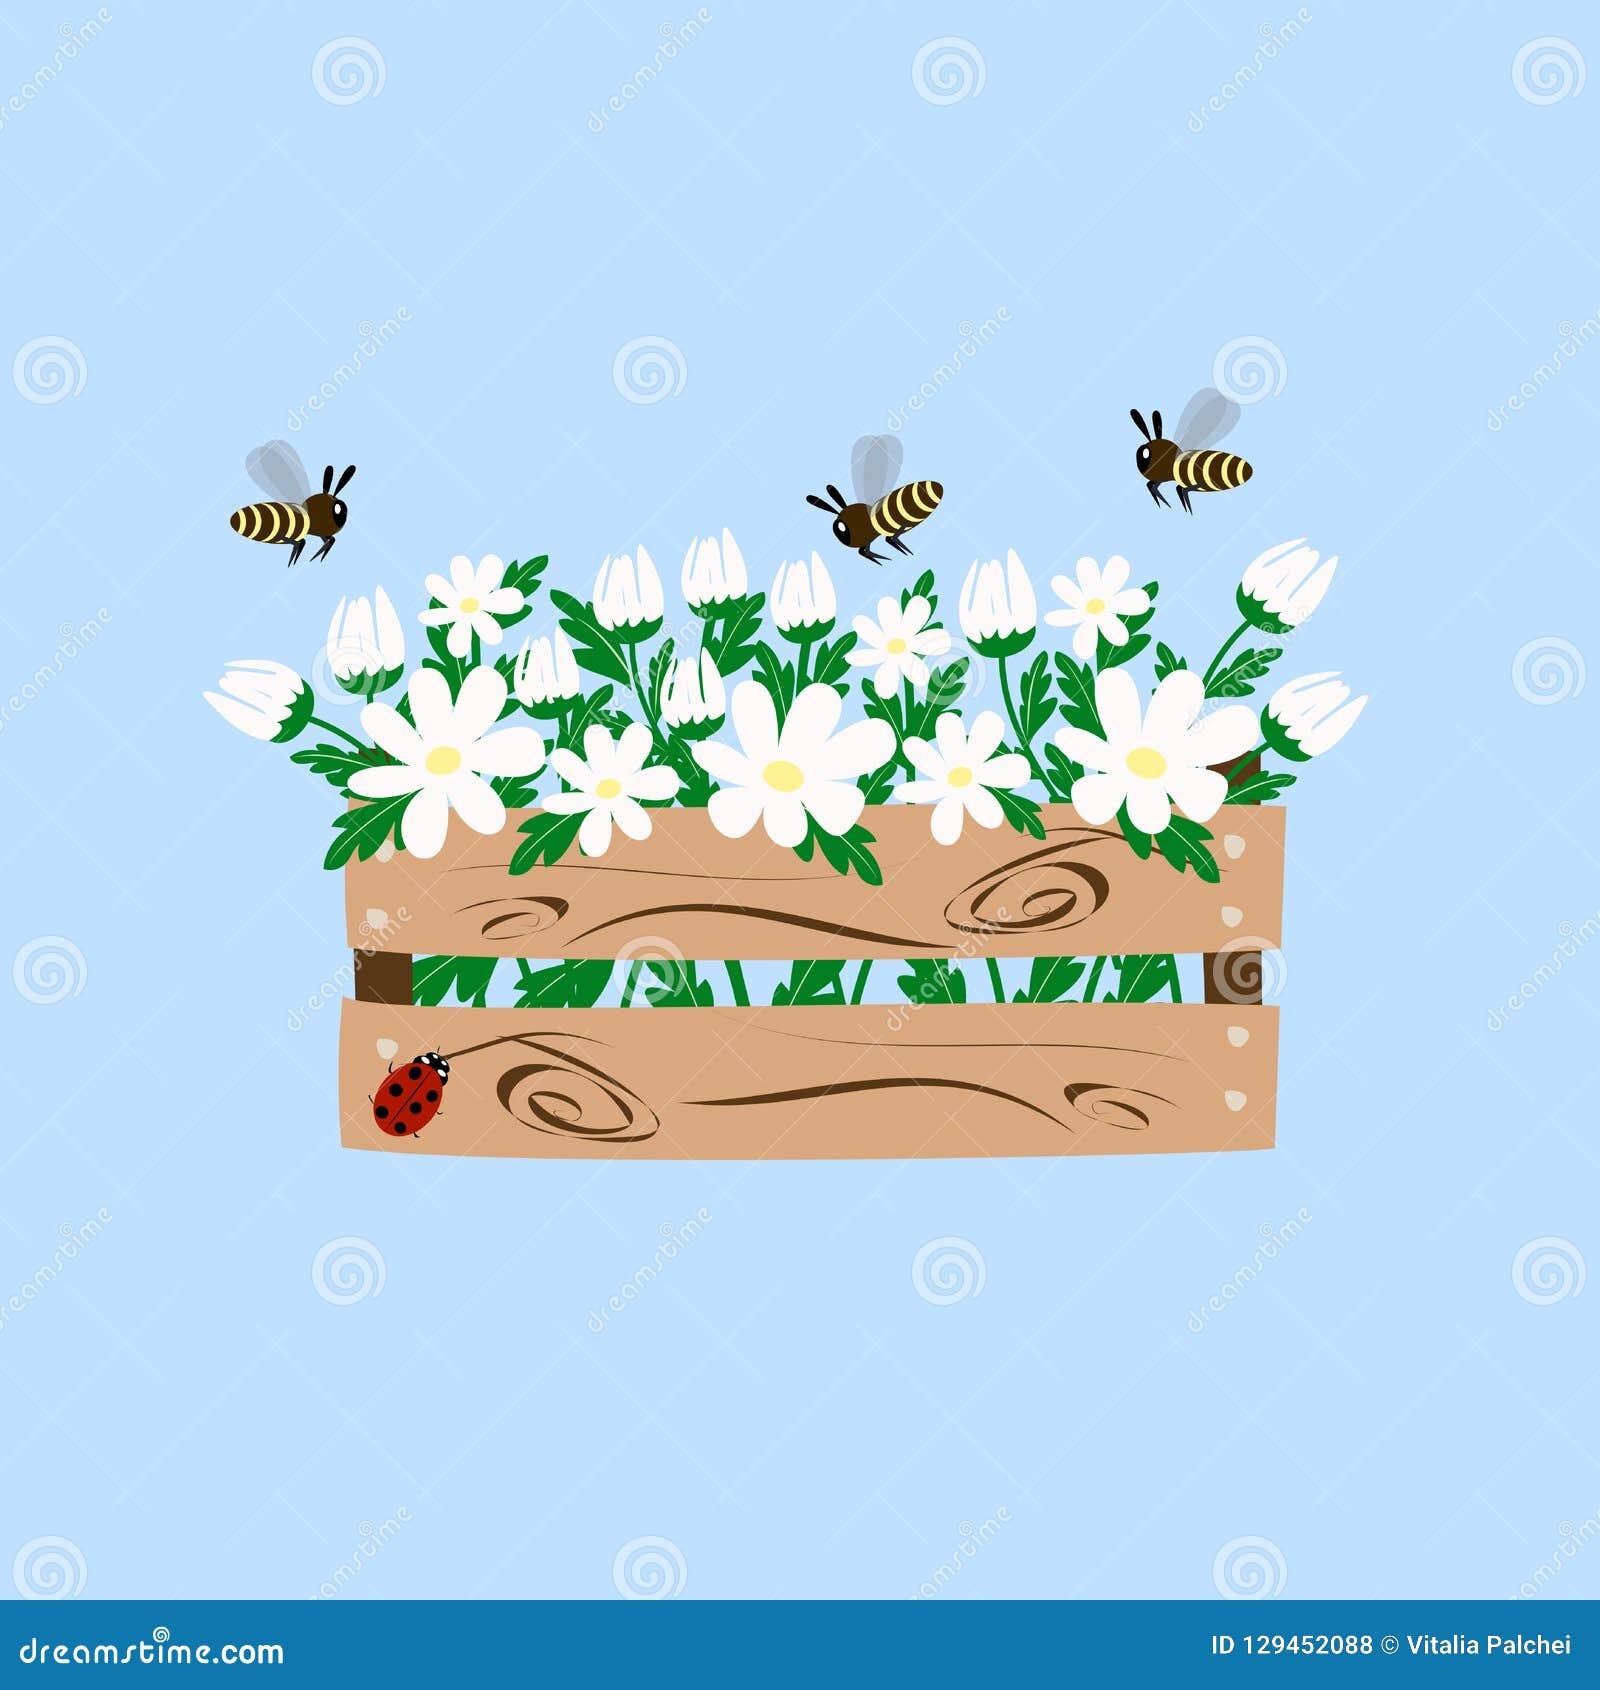 White daisy in the box